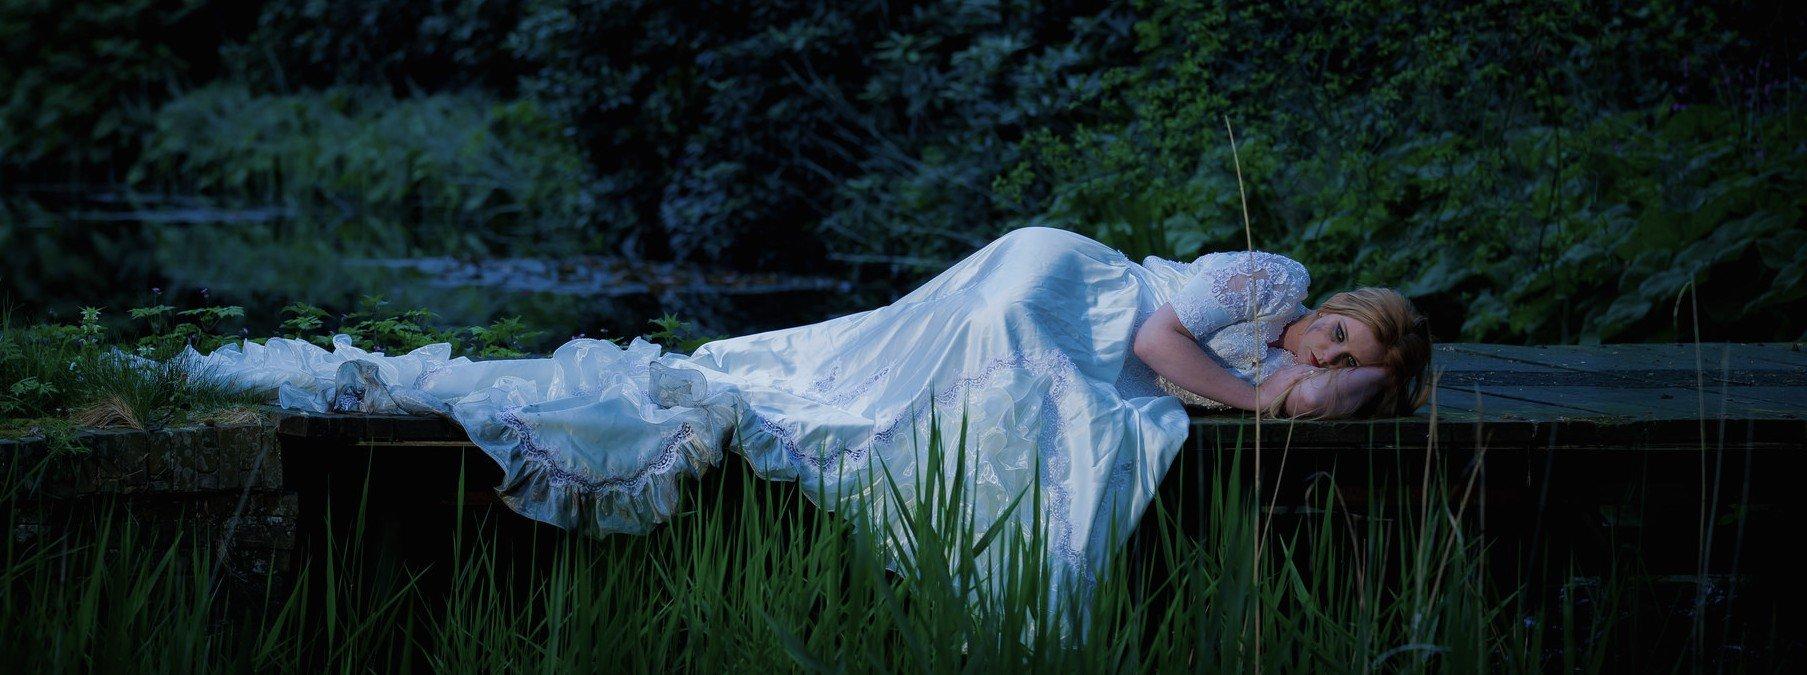 Woman sleeping in grass